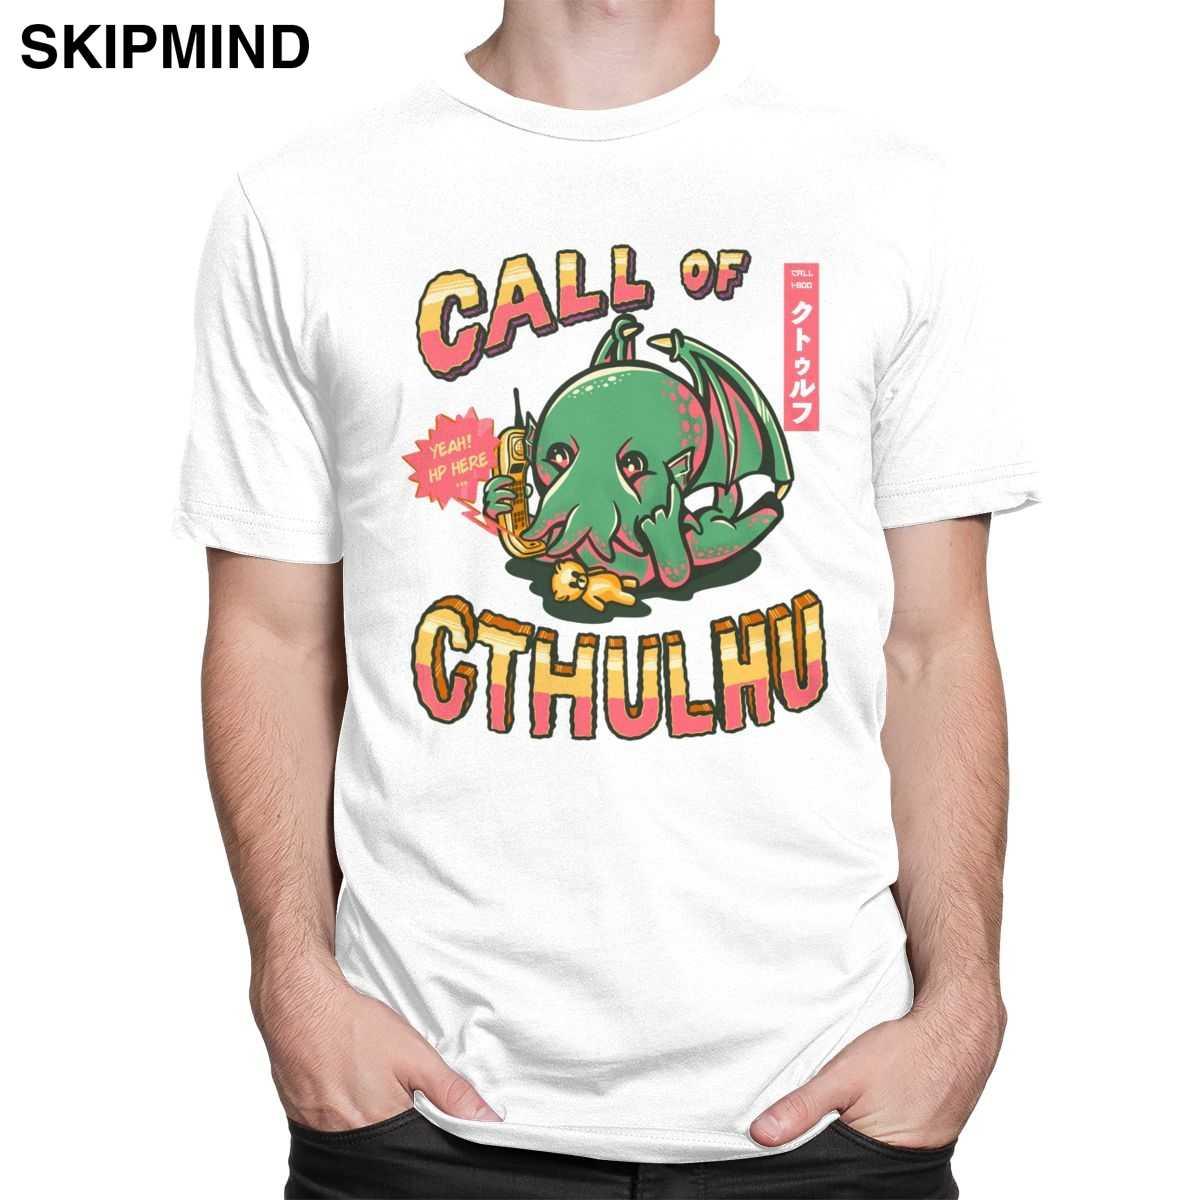 Lucu Call Of Cthulhu T Shirt Pria Kaos Oblong Lengan Pendek Lovecraft Grafis Tshirt Katun Murni Gurita Tee Tops Kasual Pakaian